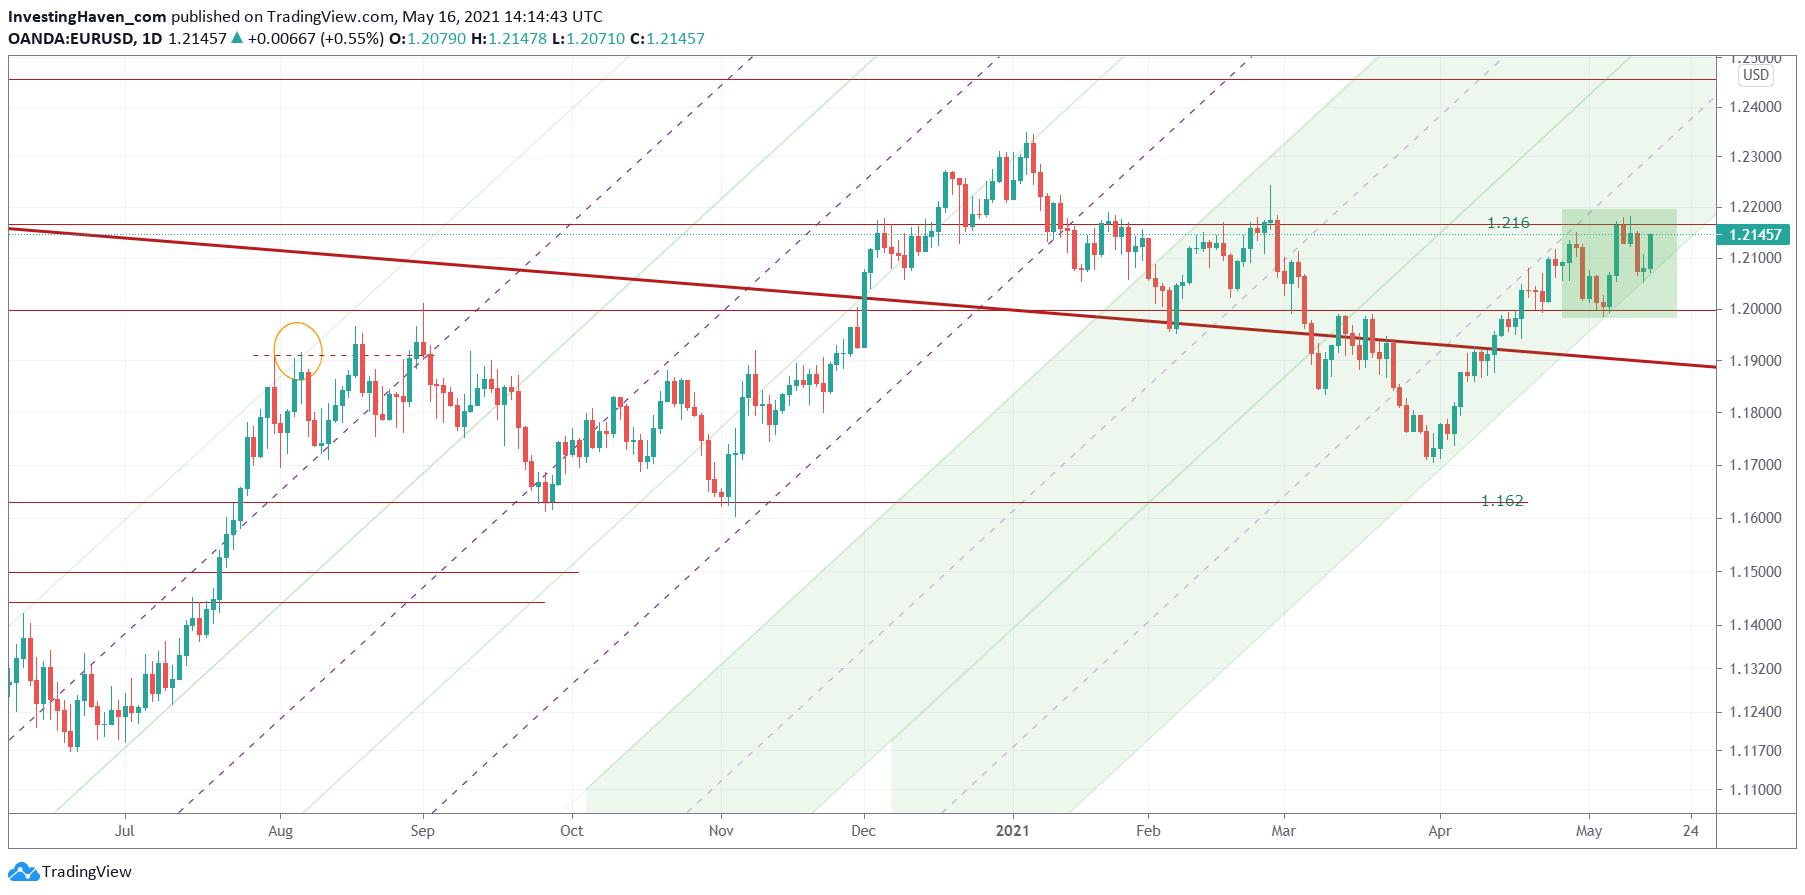 global market indicator